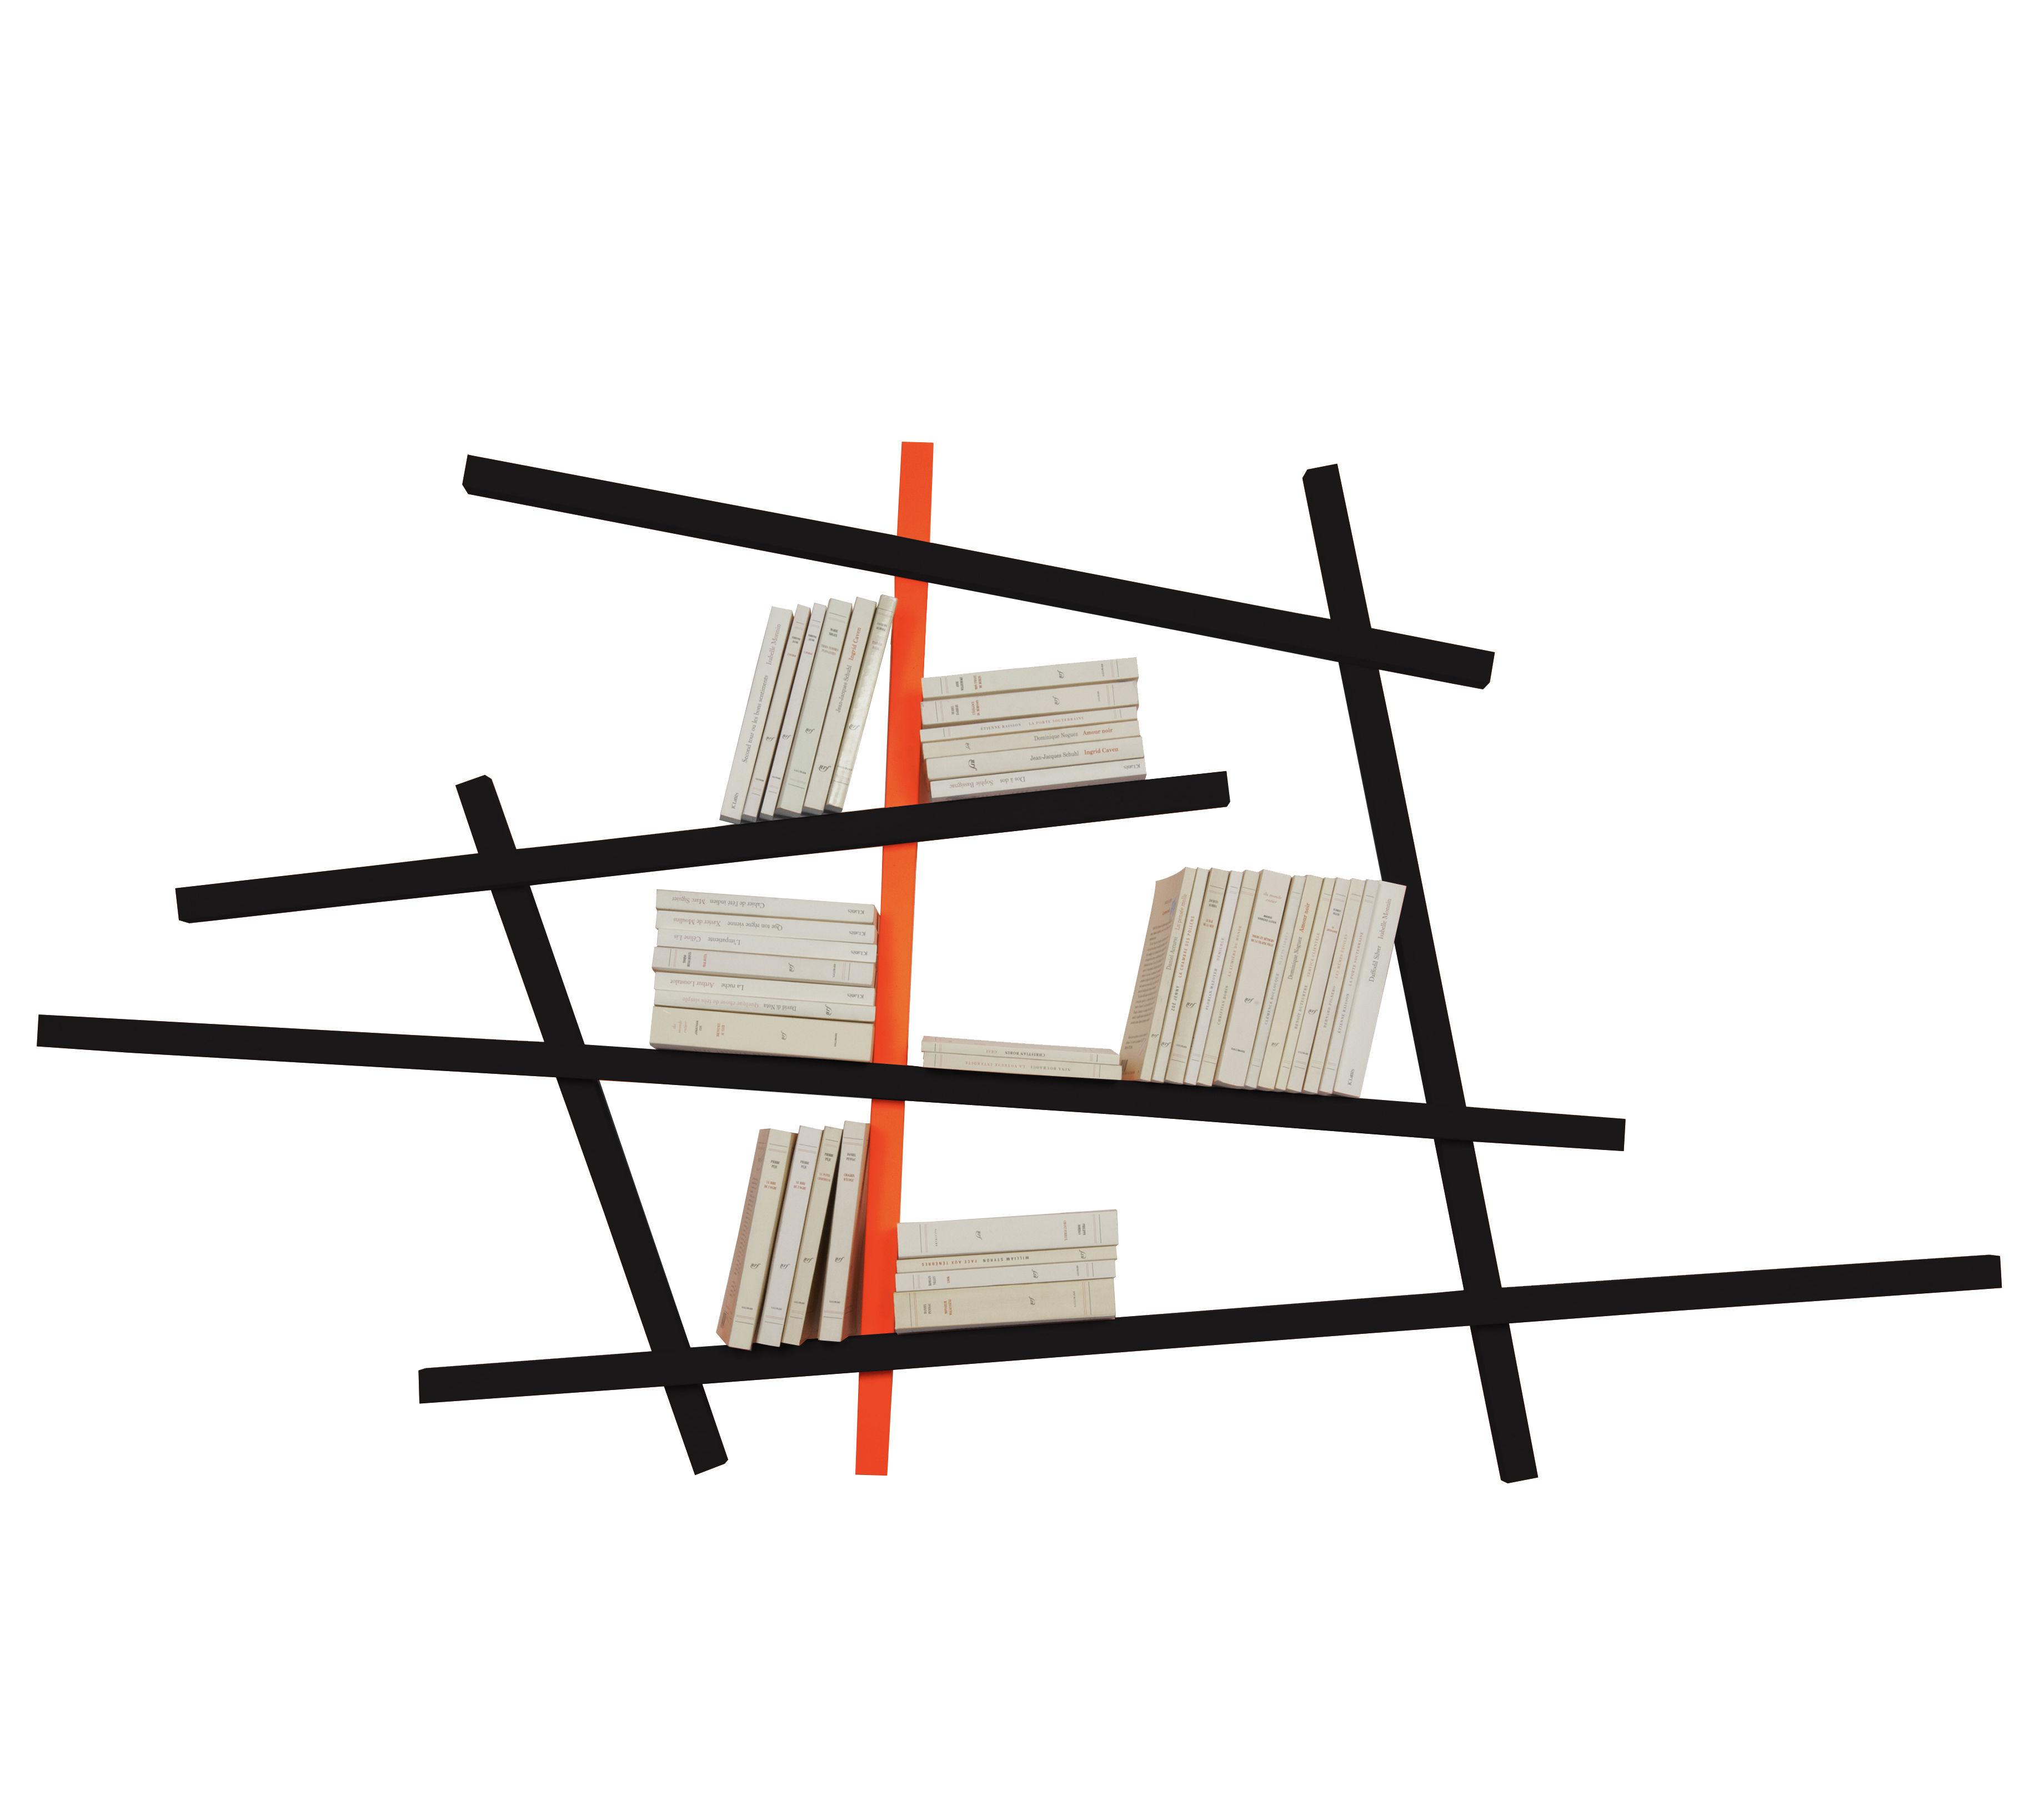 Furniture - Bookcases & Bookshelves - Mikado Small Bookcase - / L 185 x H 100 cm - Exclusive colour by Compagnie - Black / Orange - Solid oak